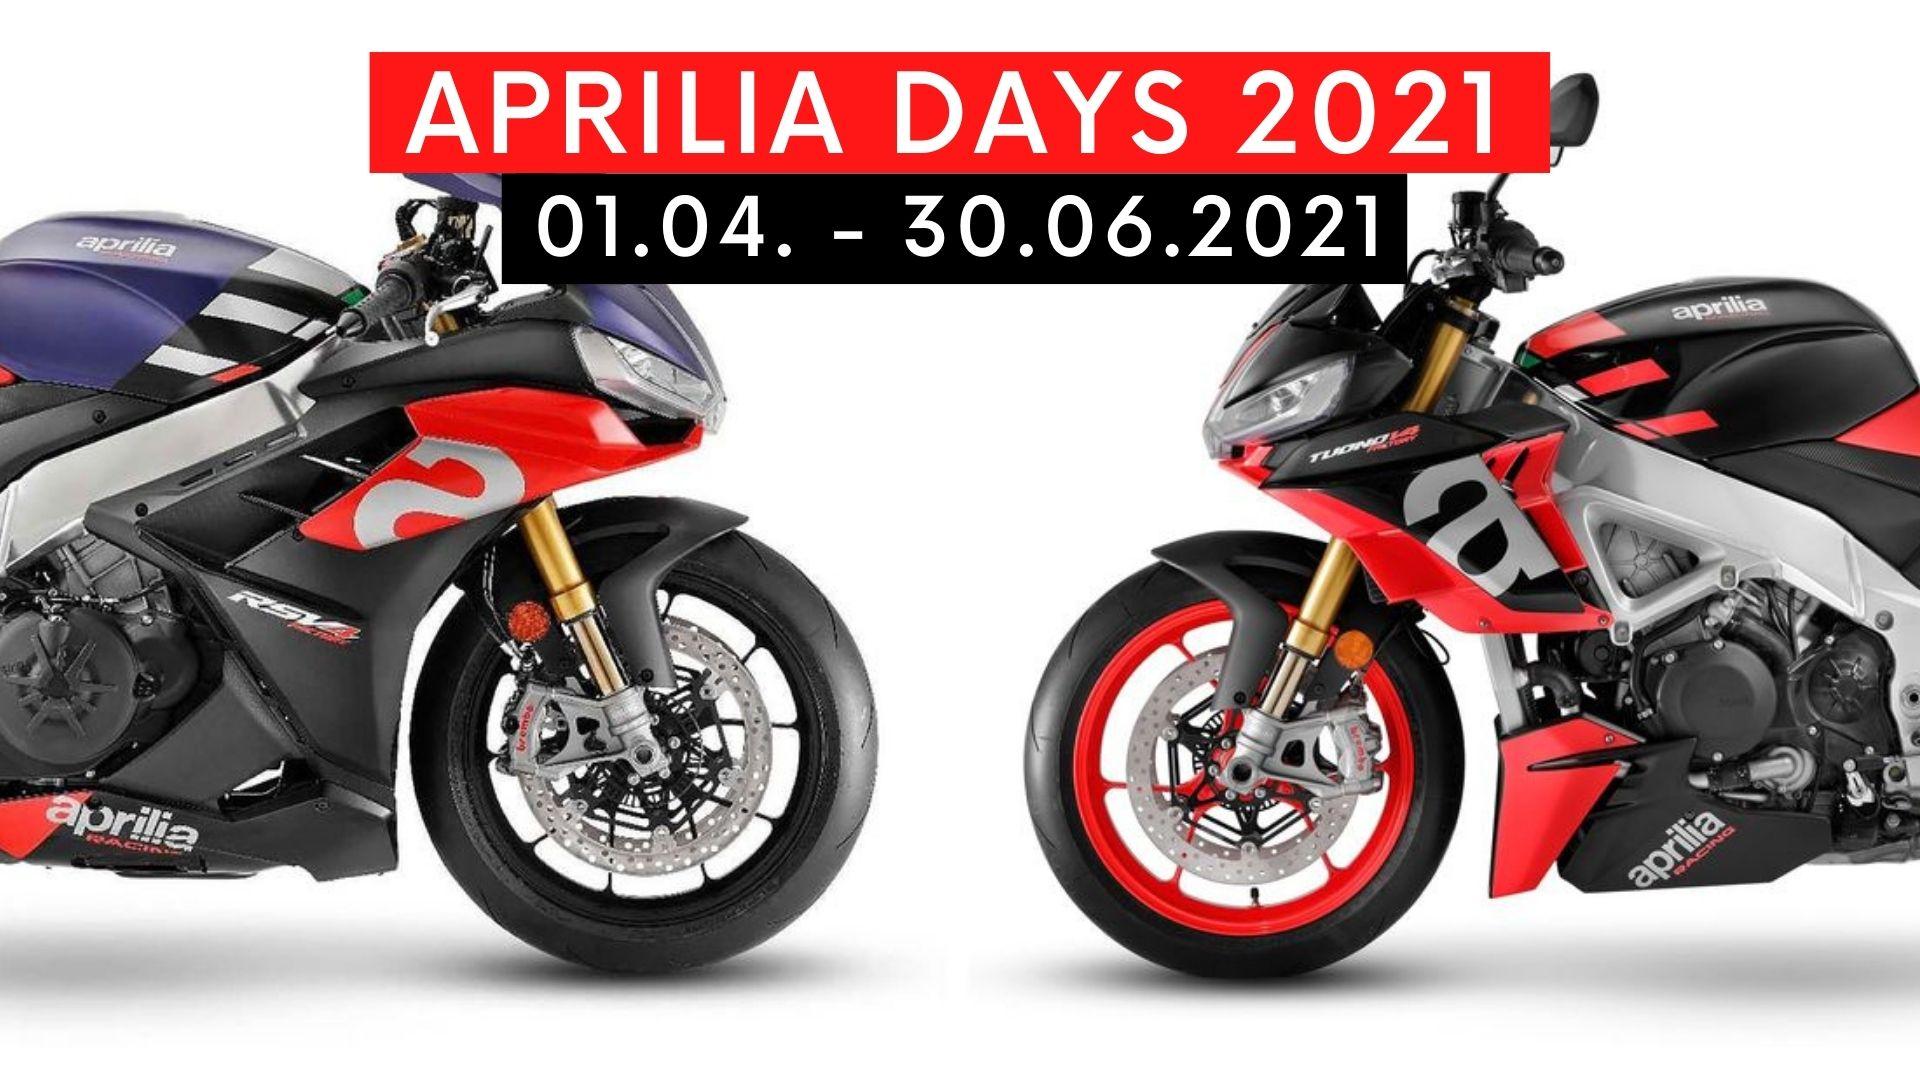 Aprilia Days 2021